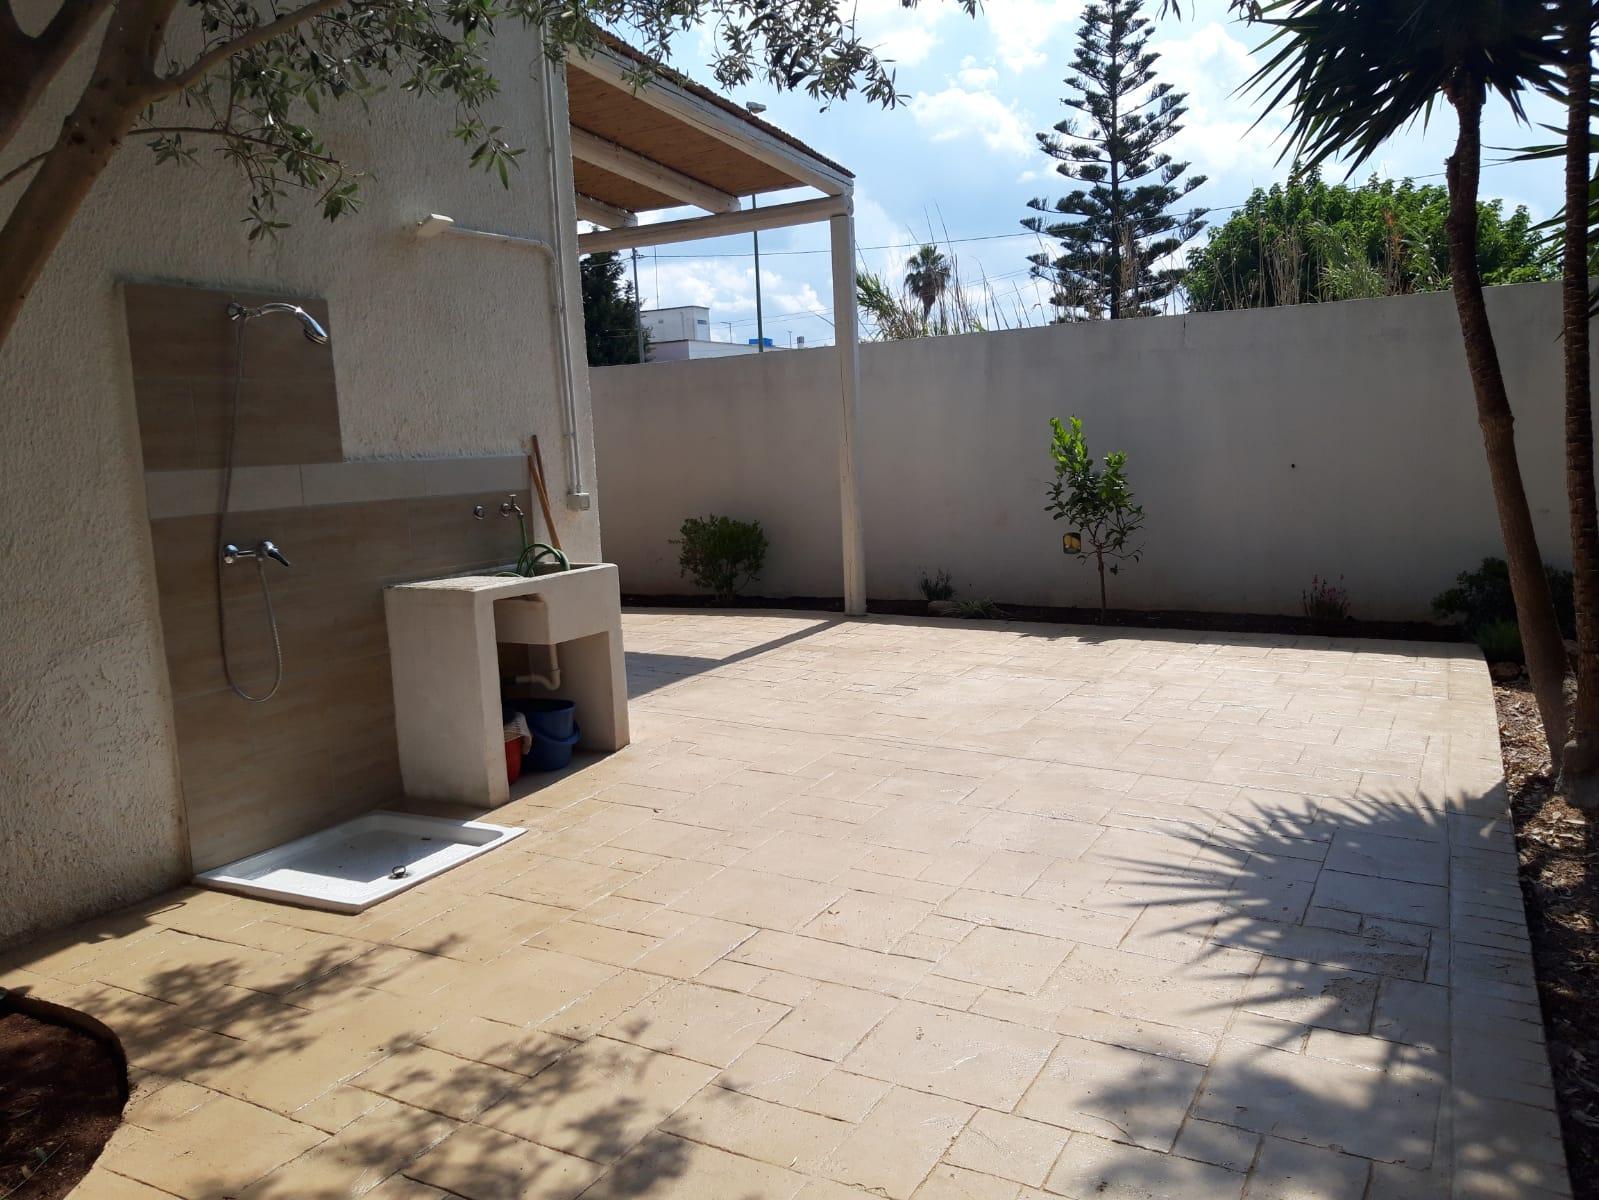 Ferienhaus Villa Mariposa n°3, only 200 meters from the beach (2354067), Porto Cesareo, Lecce, Apulien, Italien, Bild 27